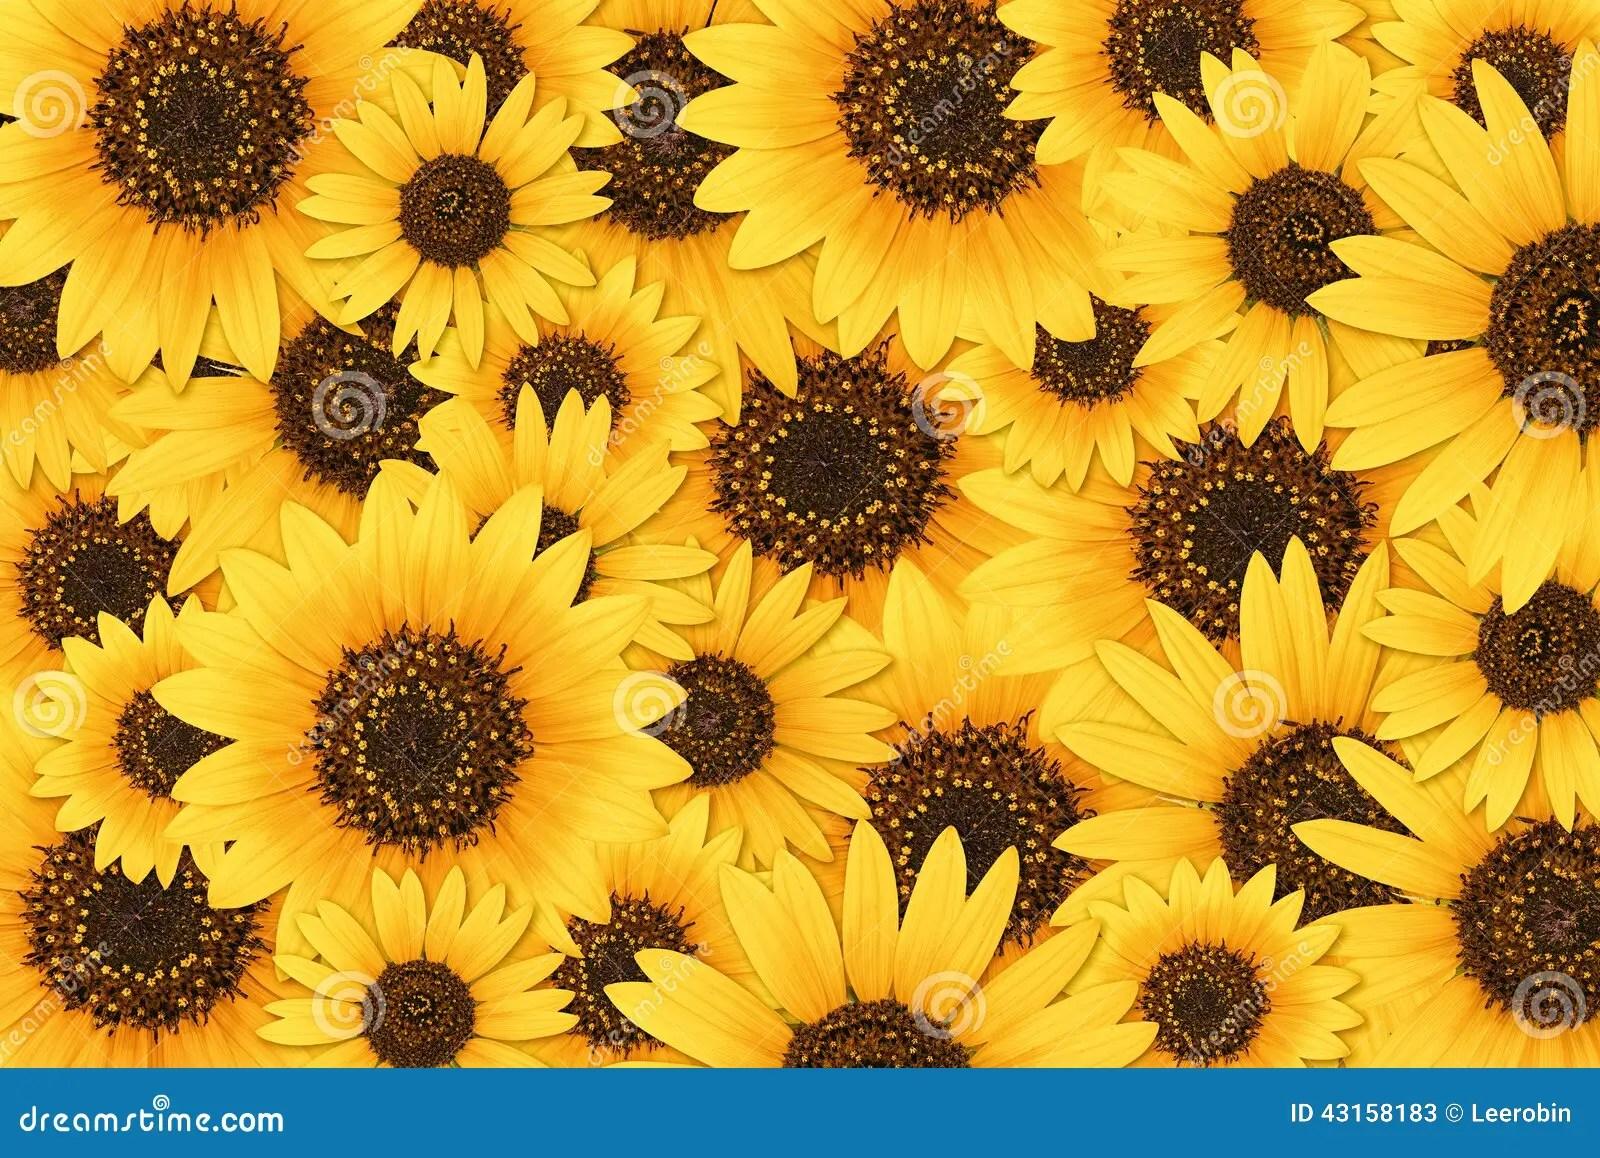 Fall Sunflower Desktop Wallpaper Sunflower Background Stock Image Image Of Helianthus